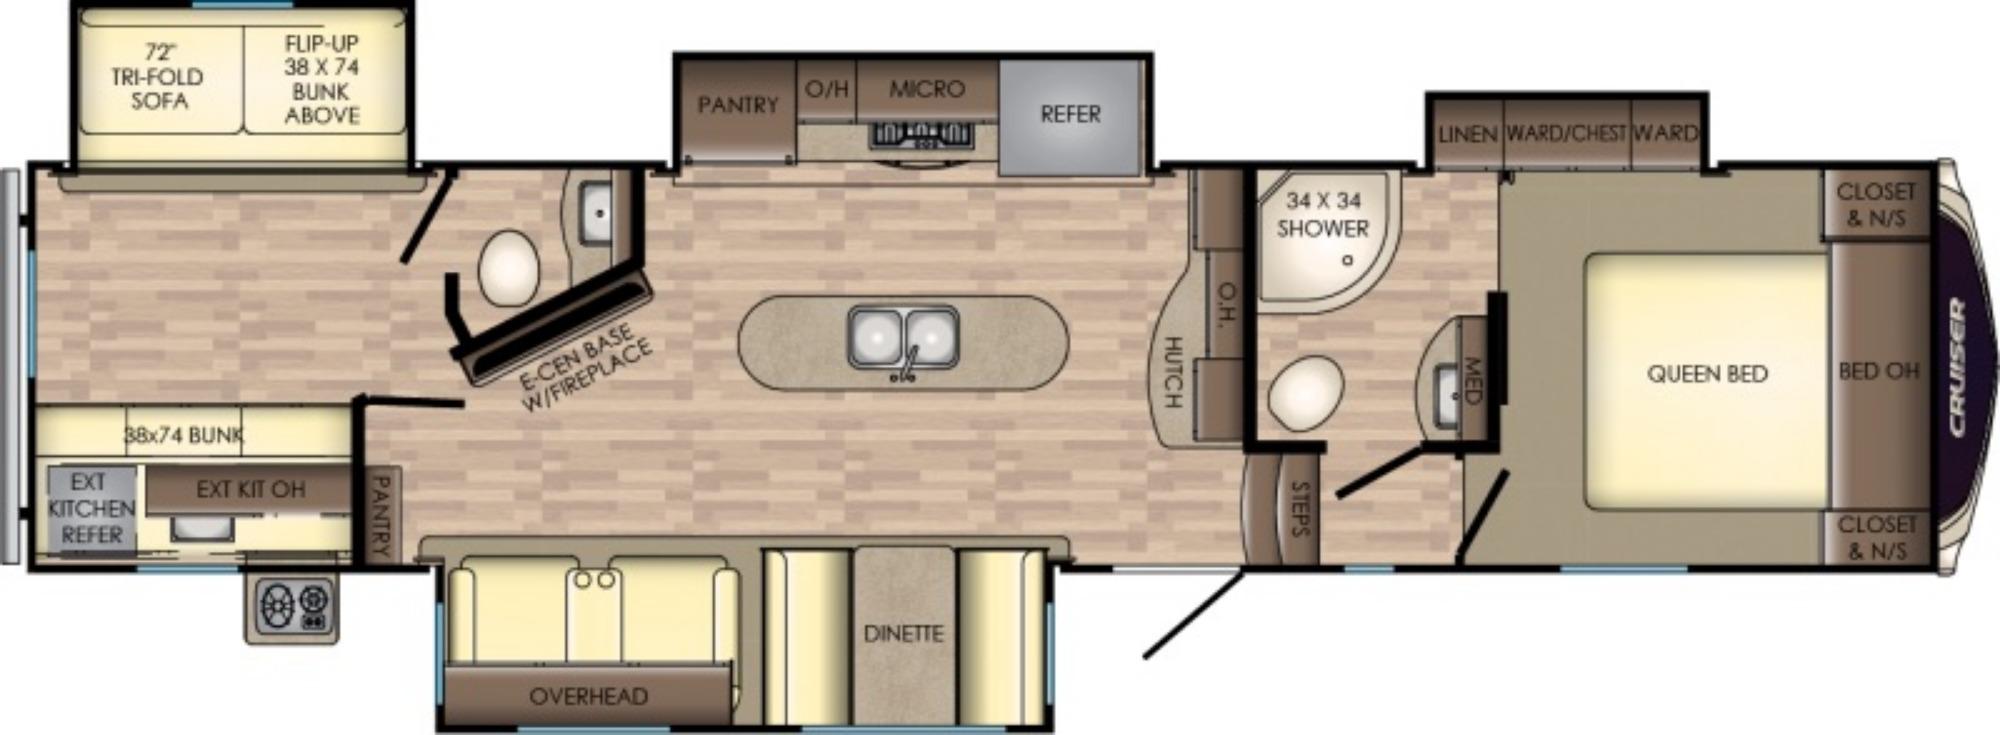 View Floor Plan for 2018 CROSSROADS CRUISER 3351BH